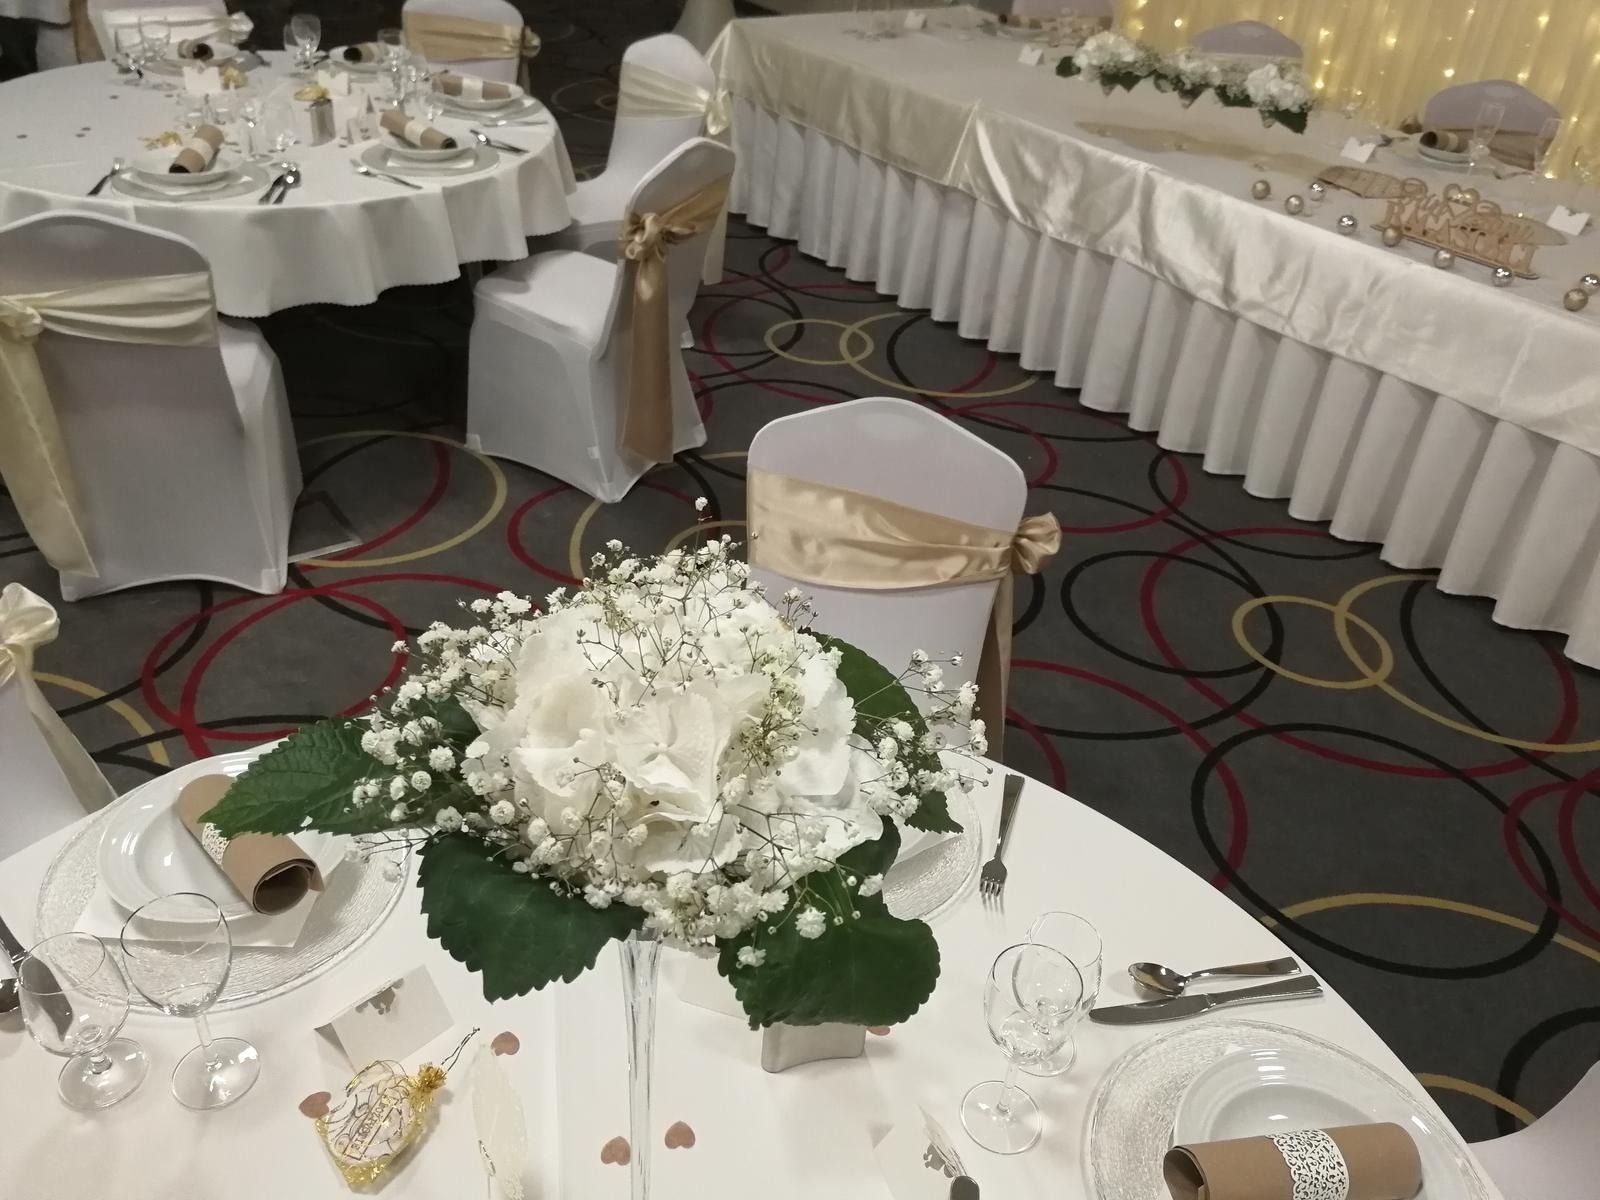 Svadba 7.4.2018 Zvolen Hotel TENIS - Obrázok č. 23